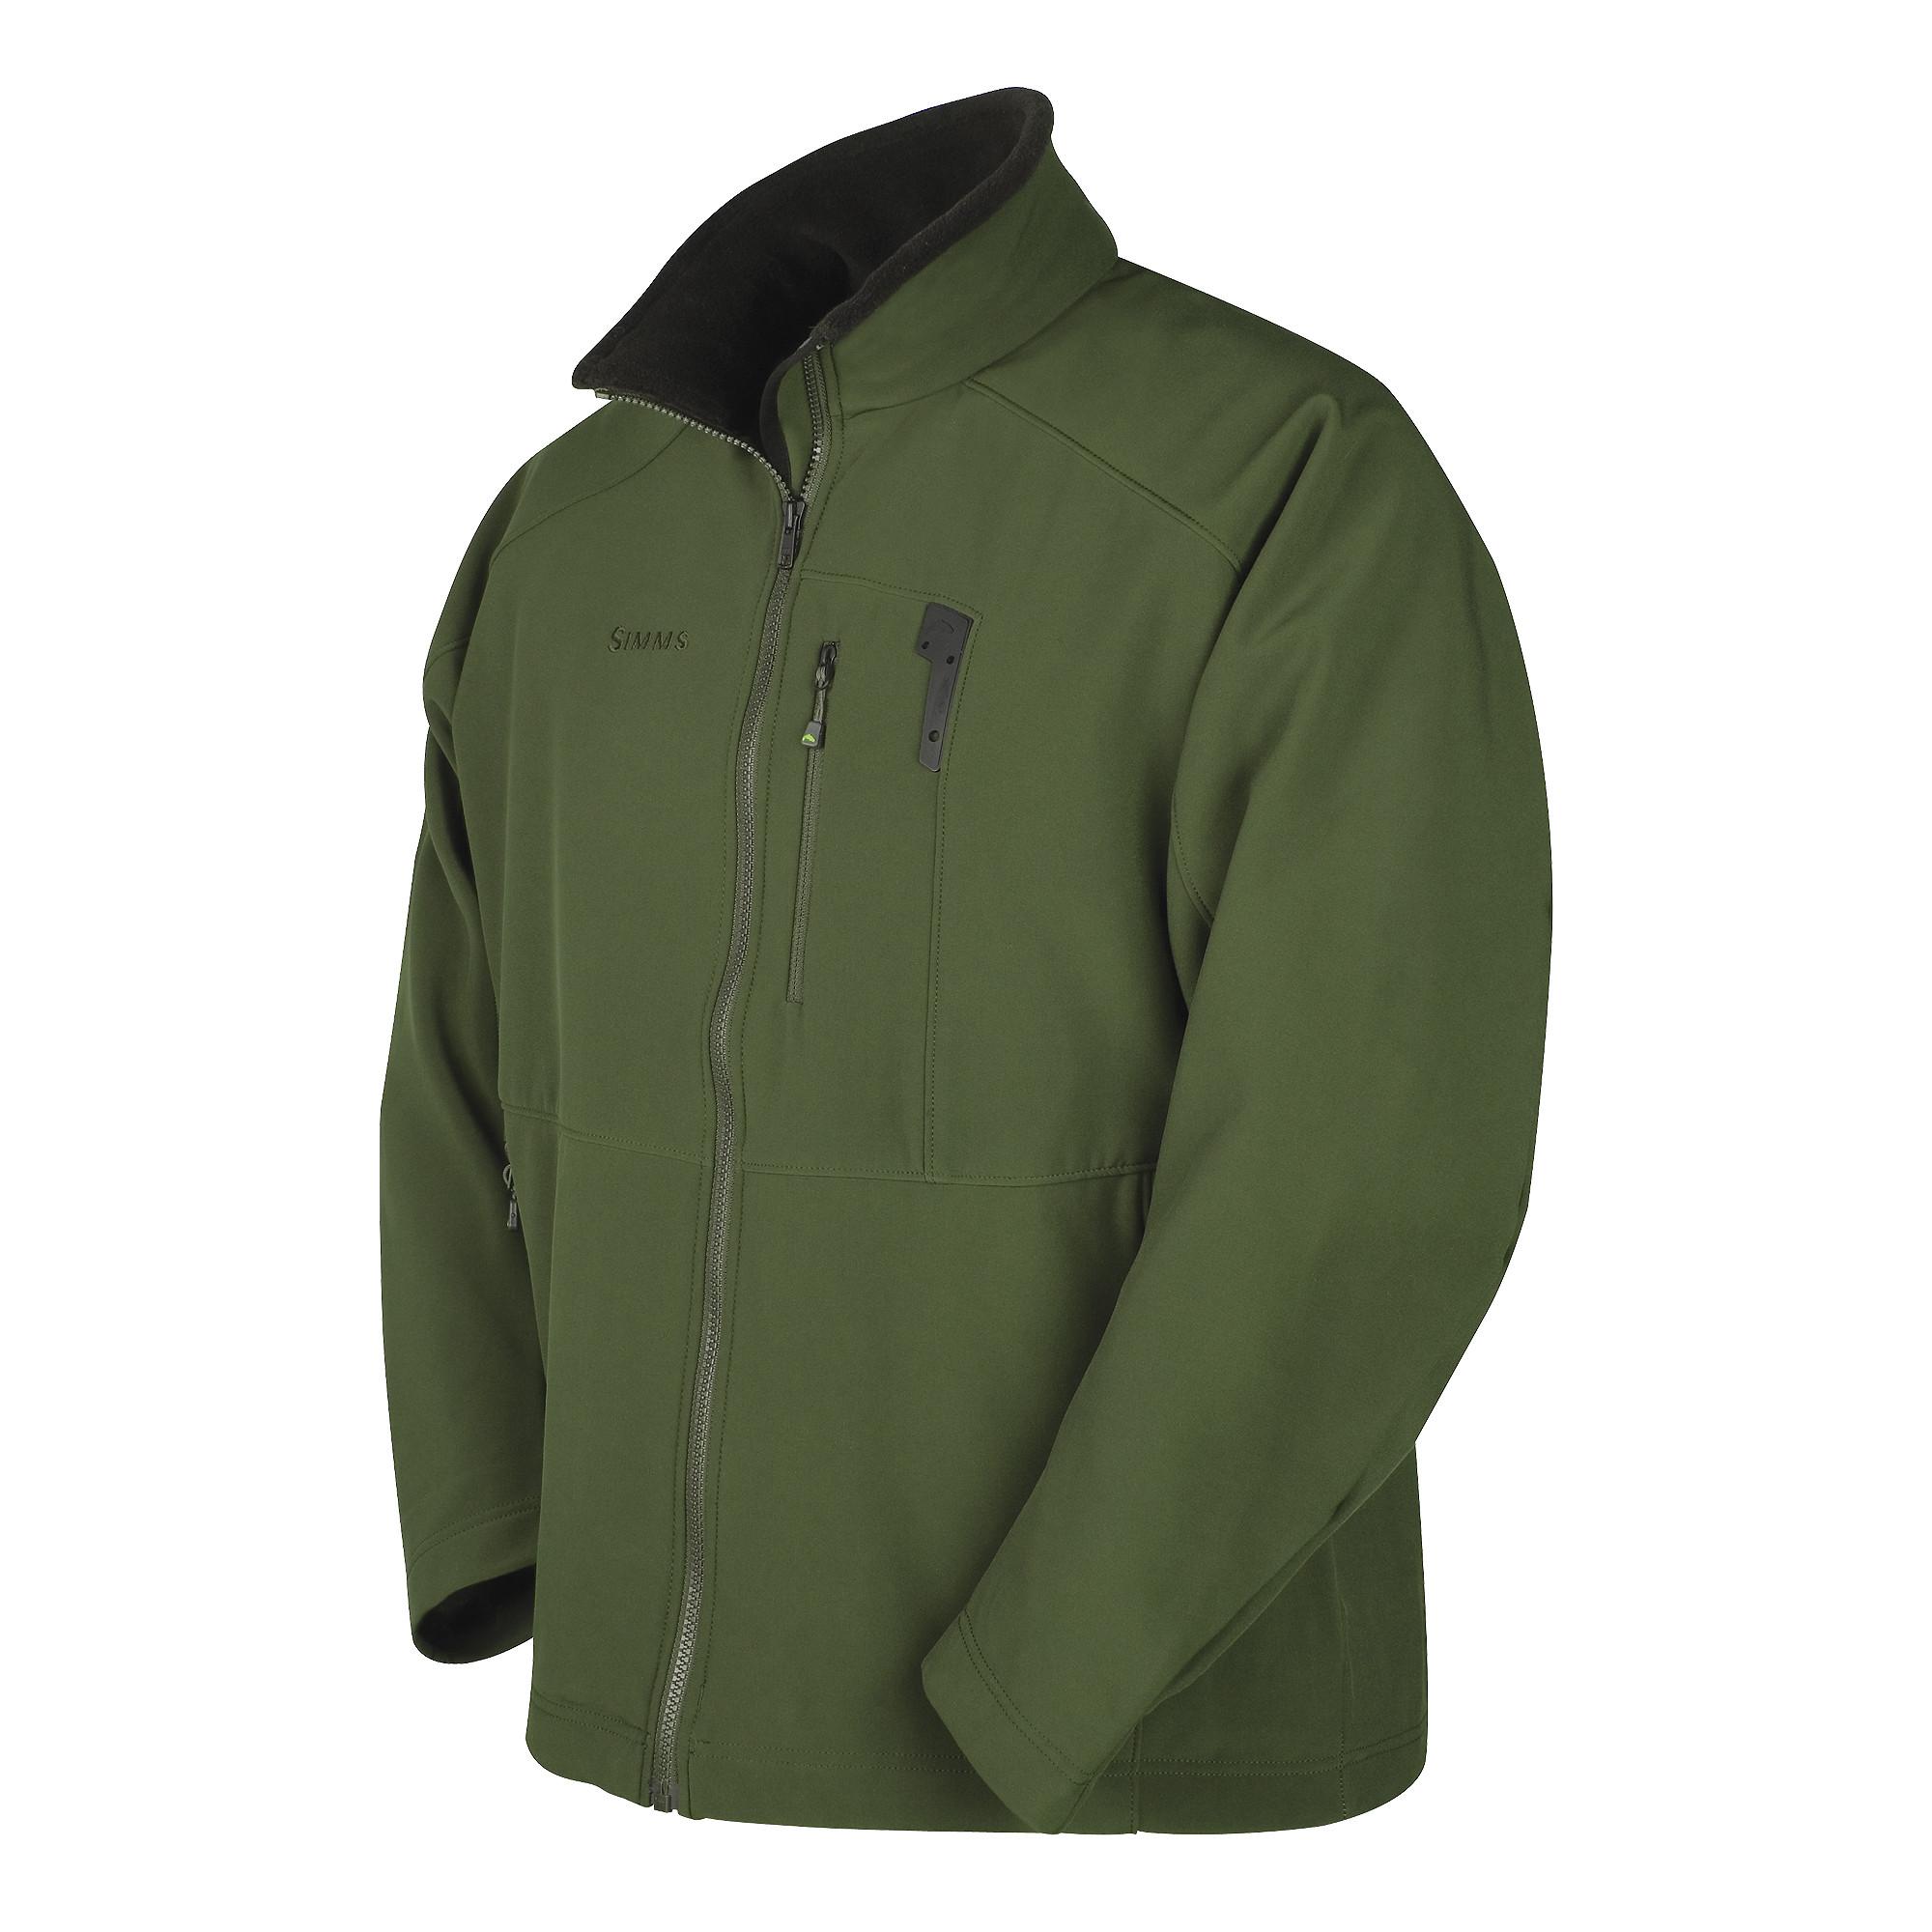 Simms Freestone Soft Shell Jacket Flyfishingeurope Shop De